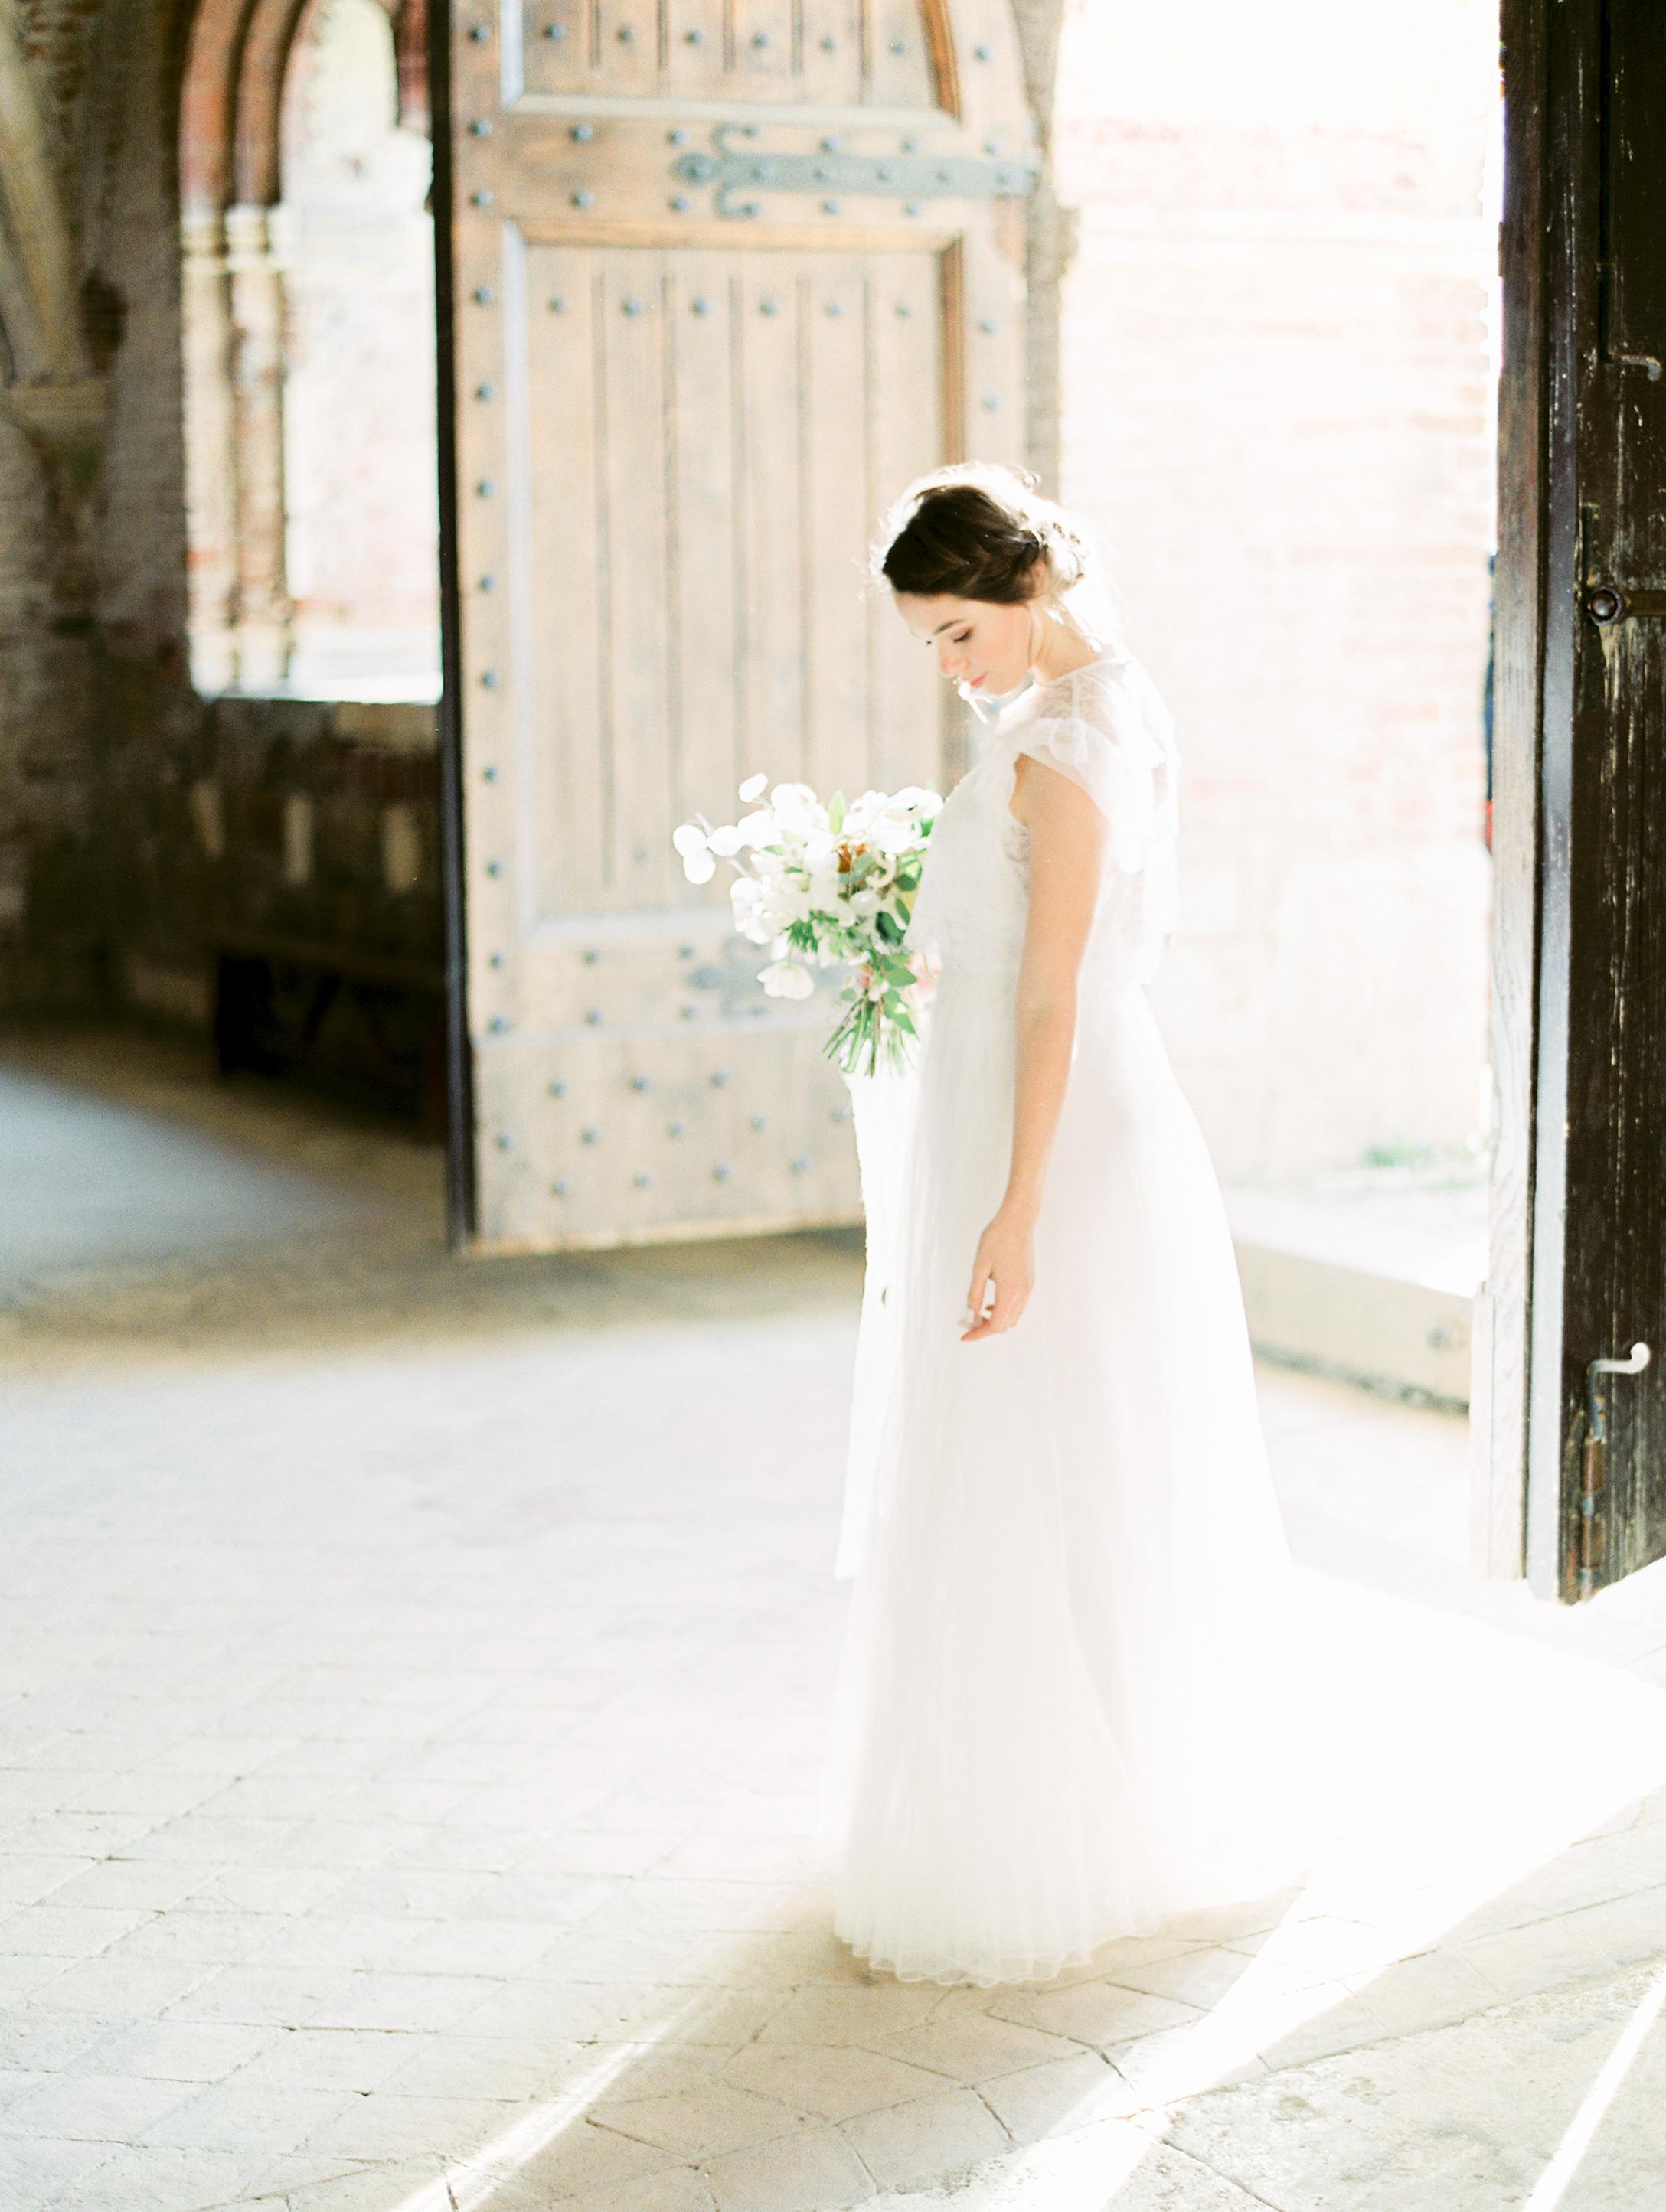 romantic-italy-wedding-in-tuscany-96.jpg